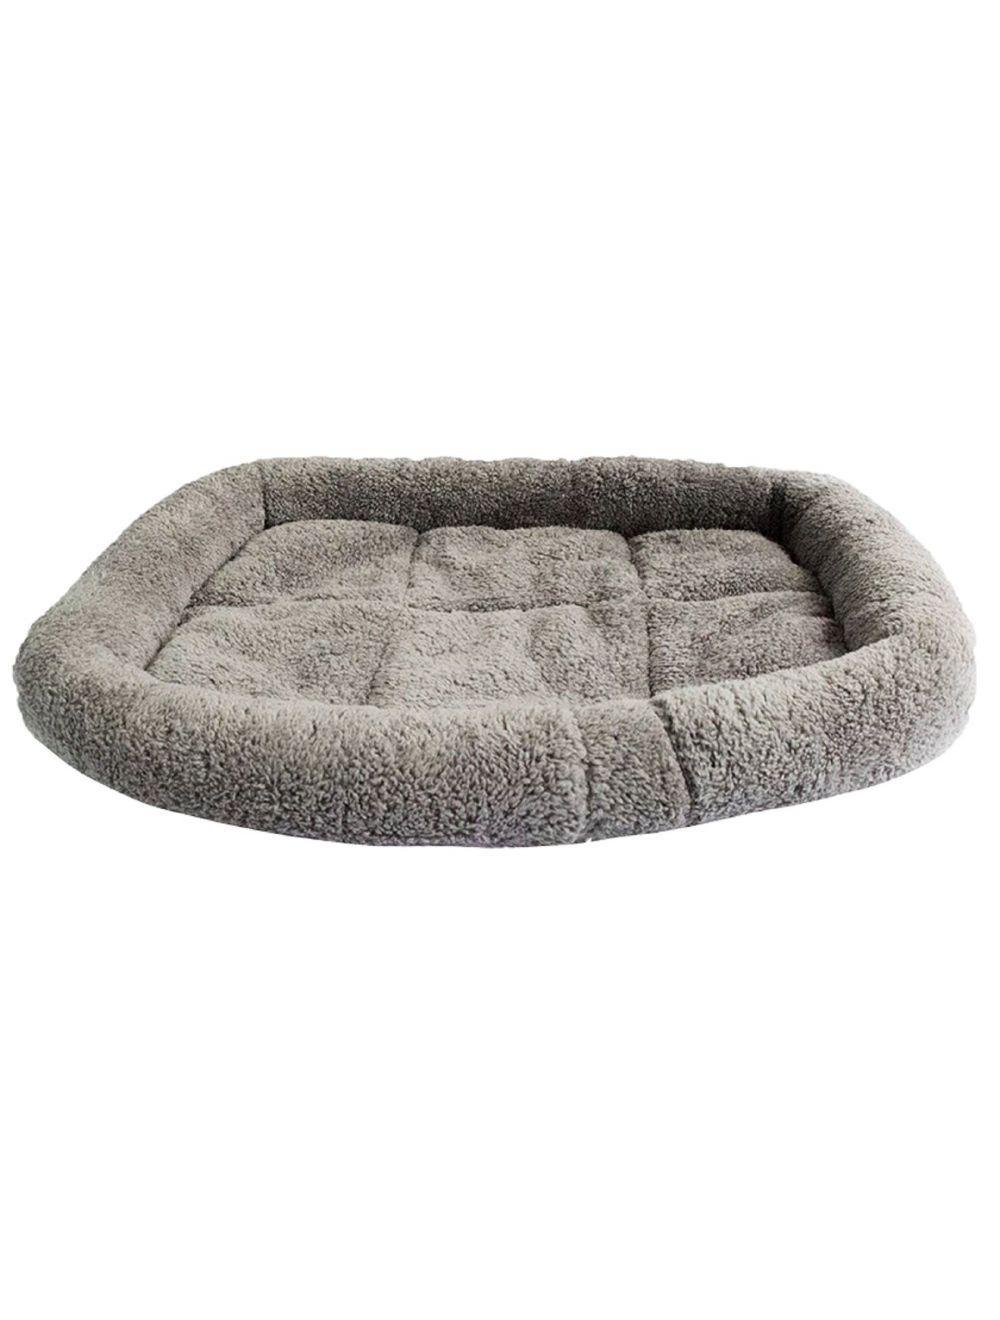 Cama 4dogs para perro soft talla L - Ciudaddemascotas.com